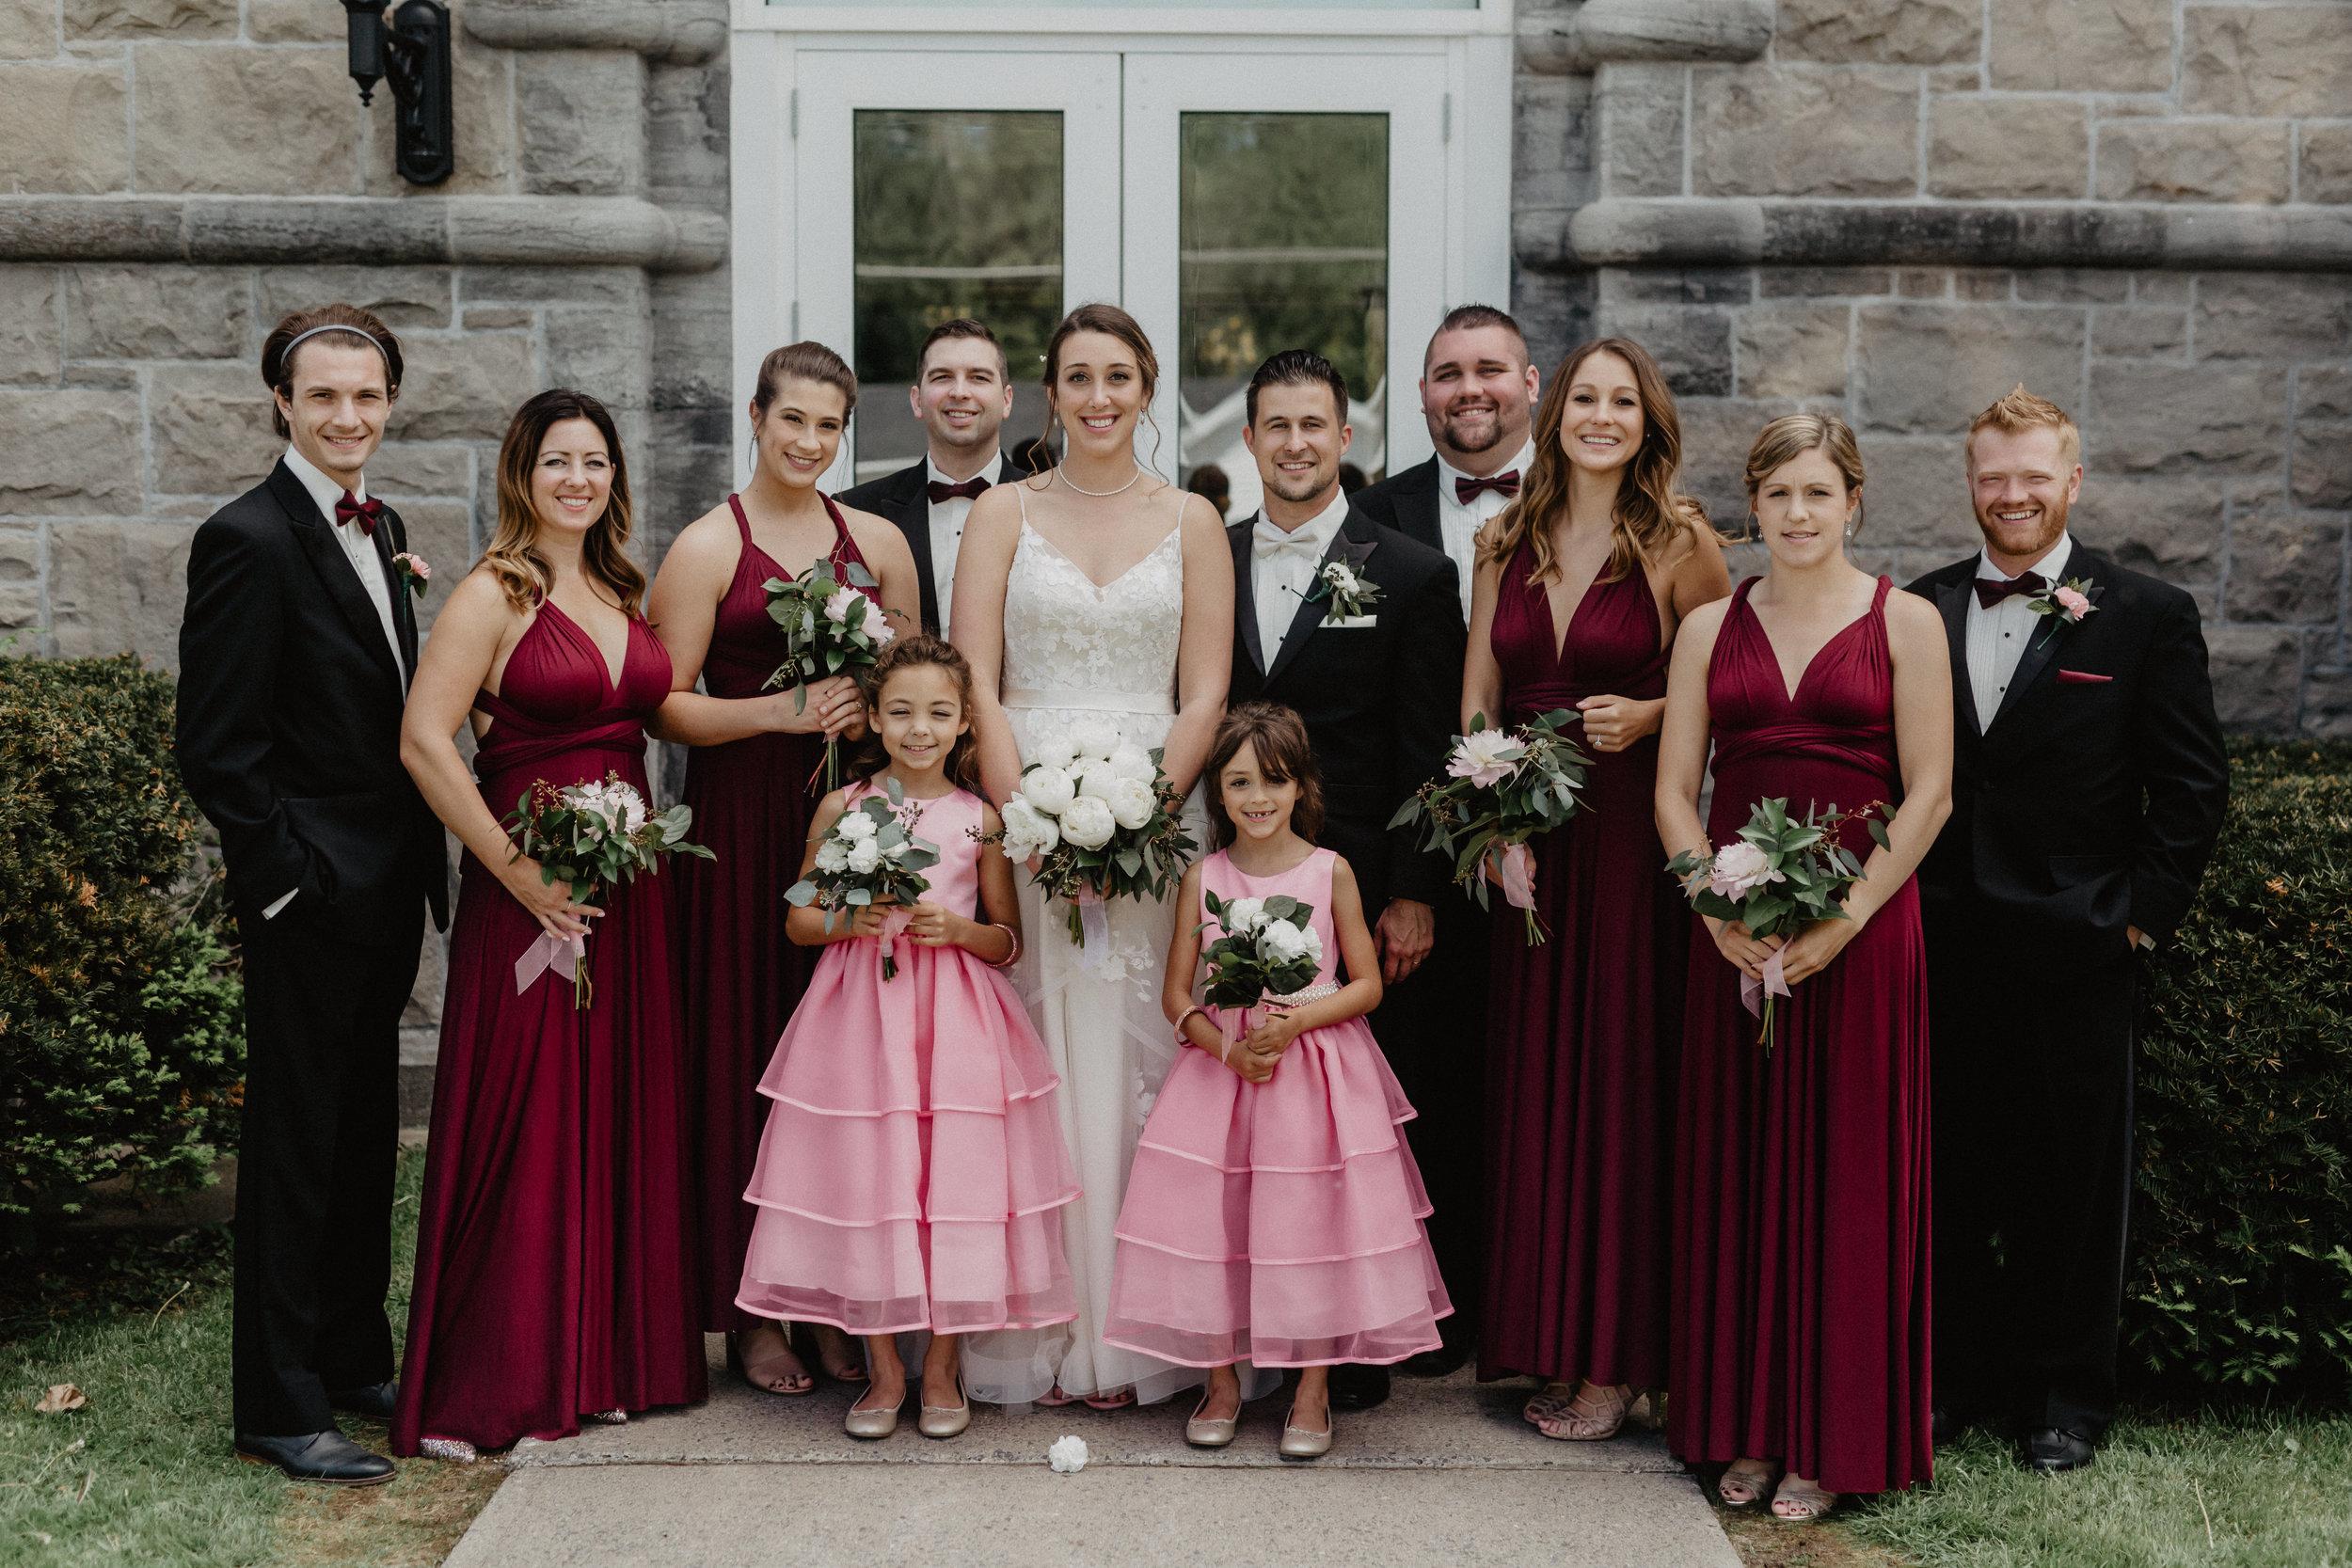 upstate_ny_wedding-33.jpg